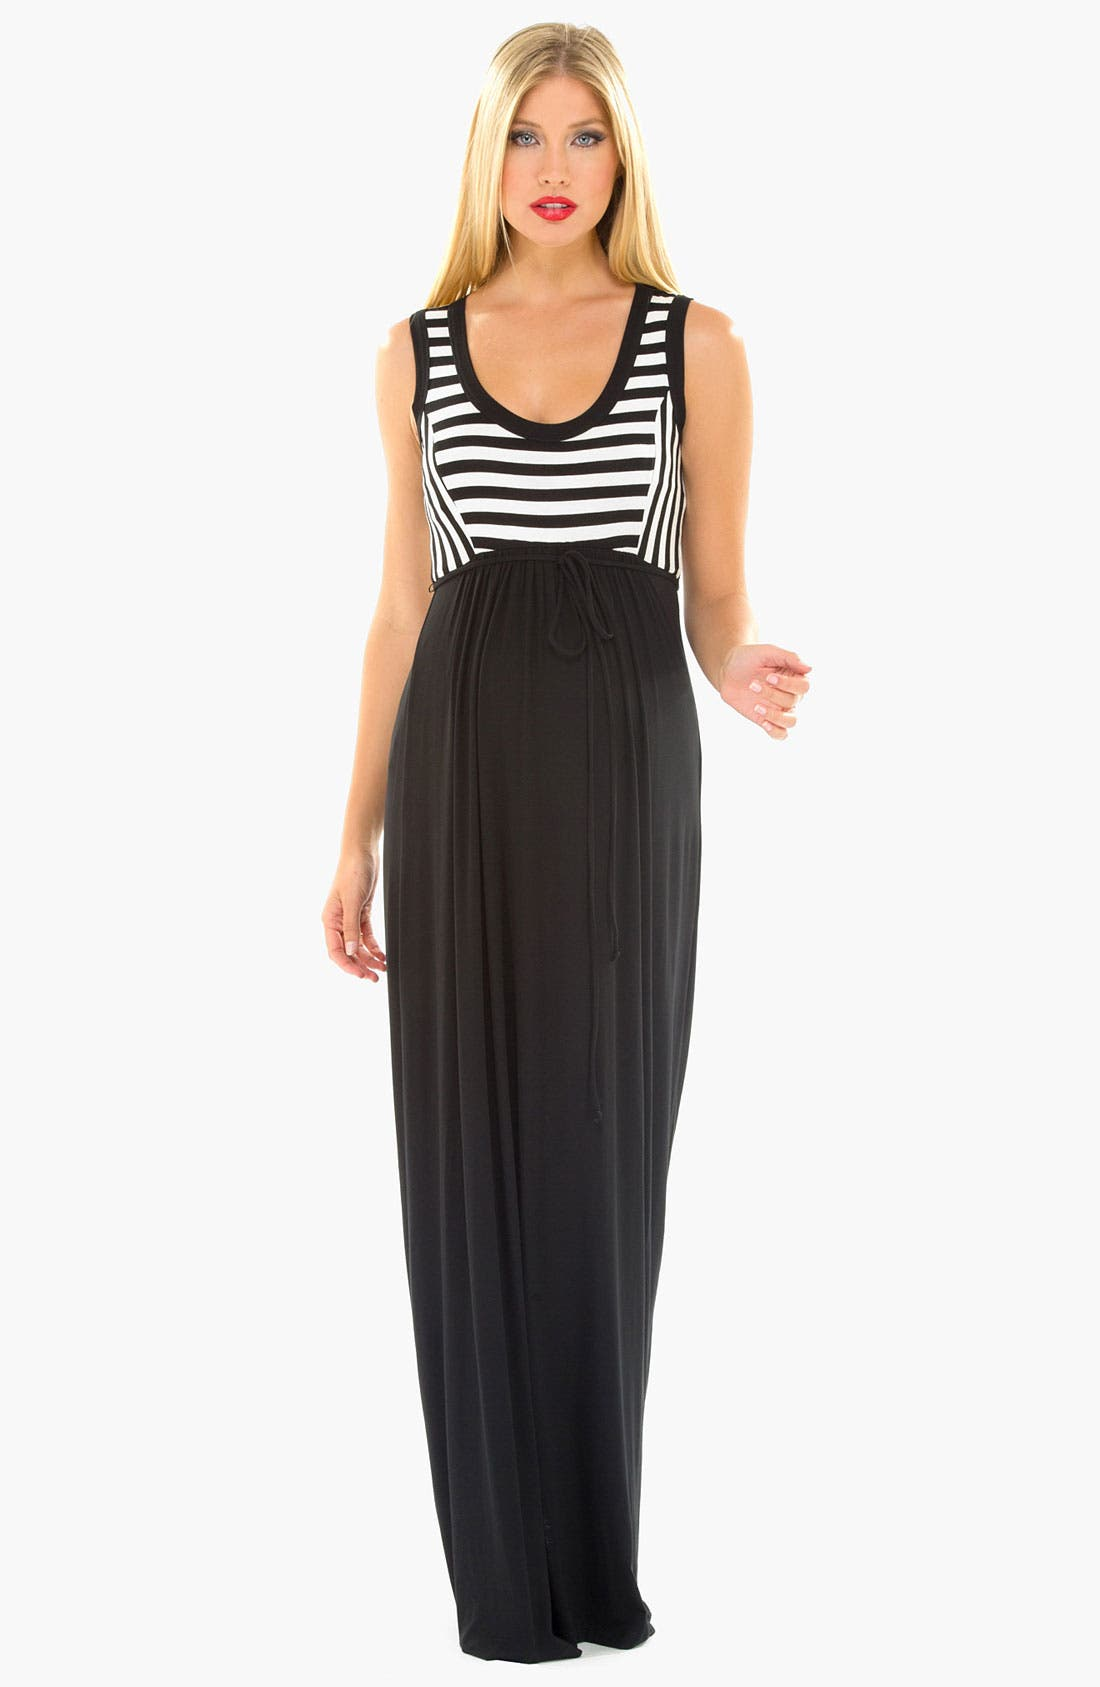 Alternate Image 1 Selected - Olian Stripe Knit Maternity Maxi Dress